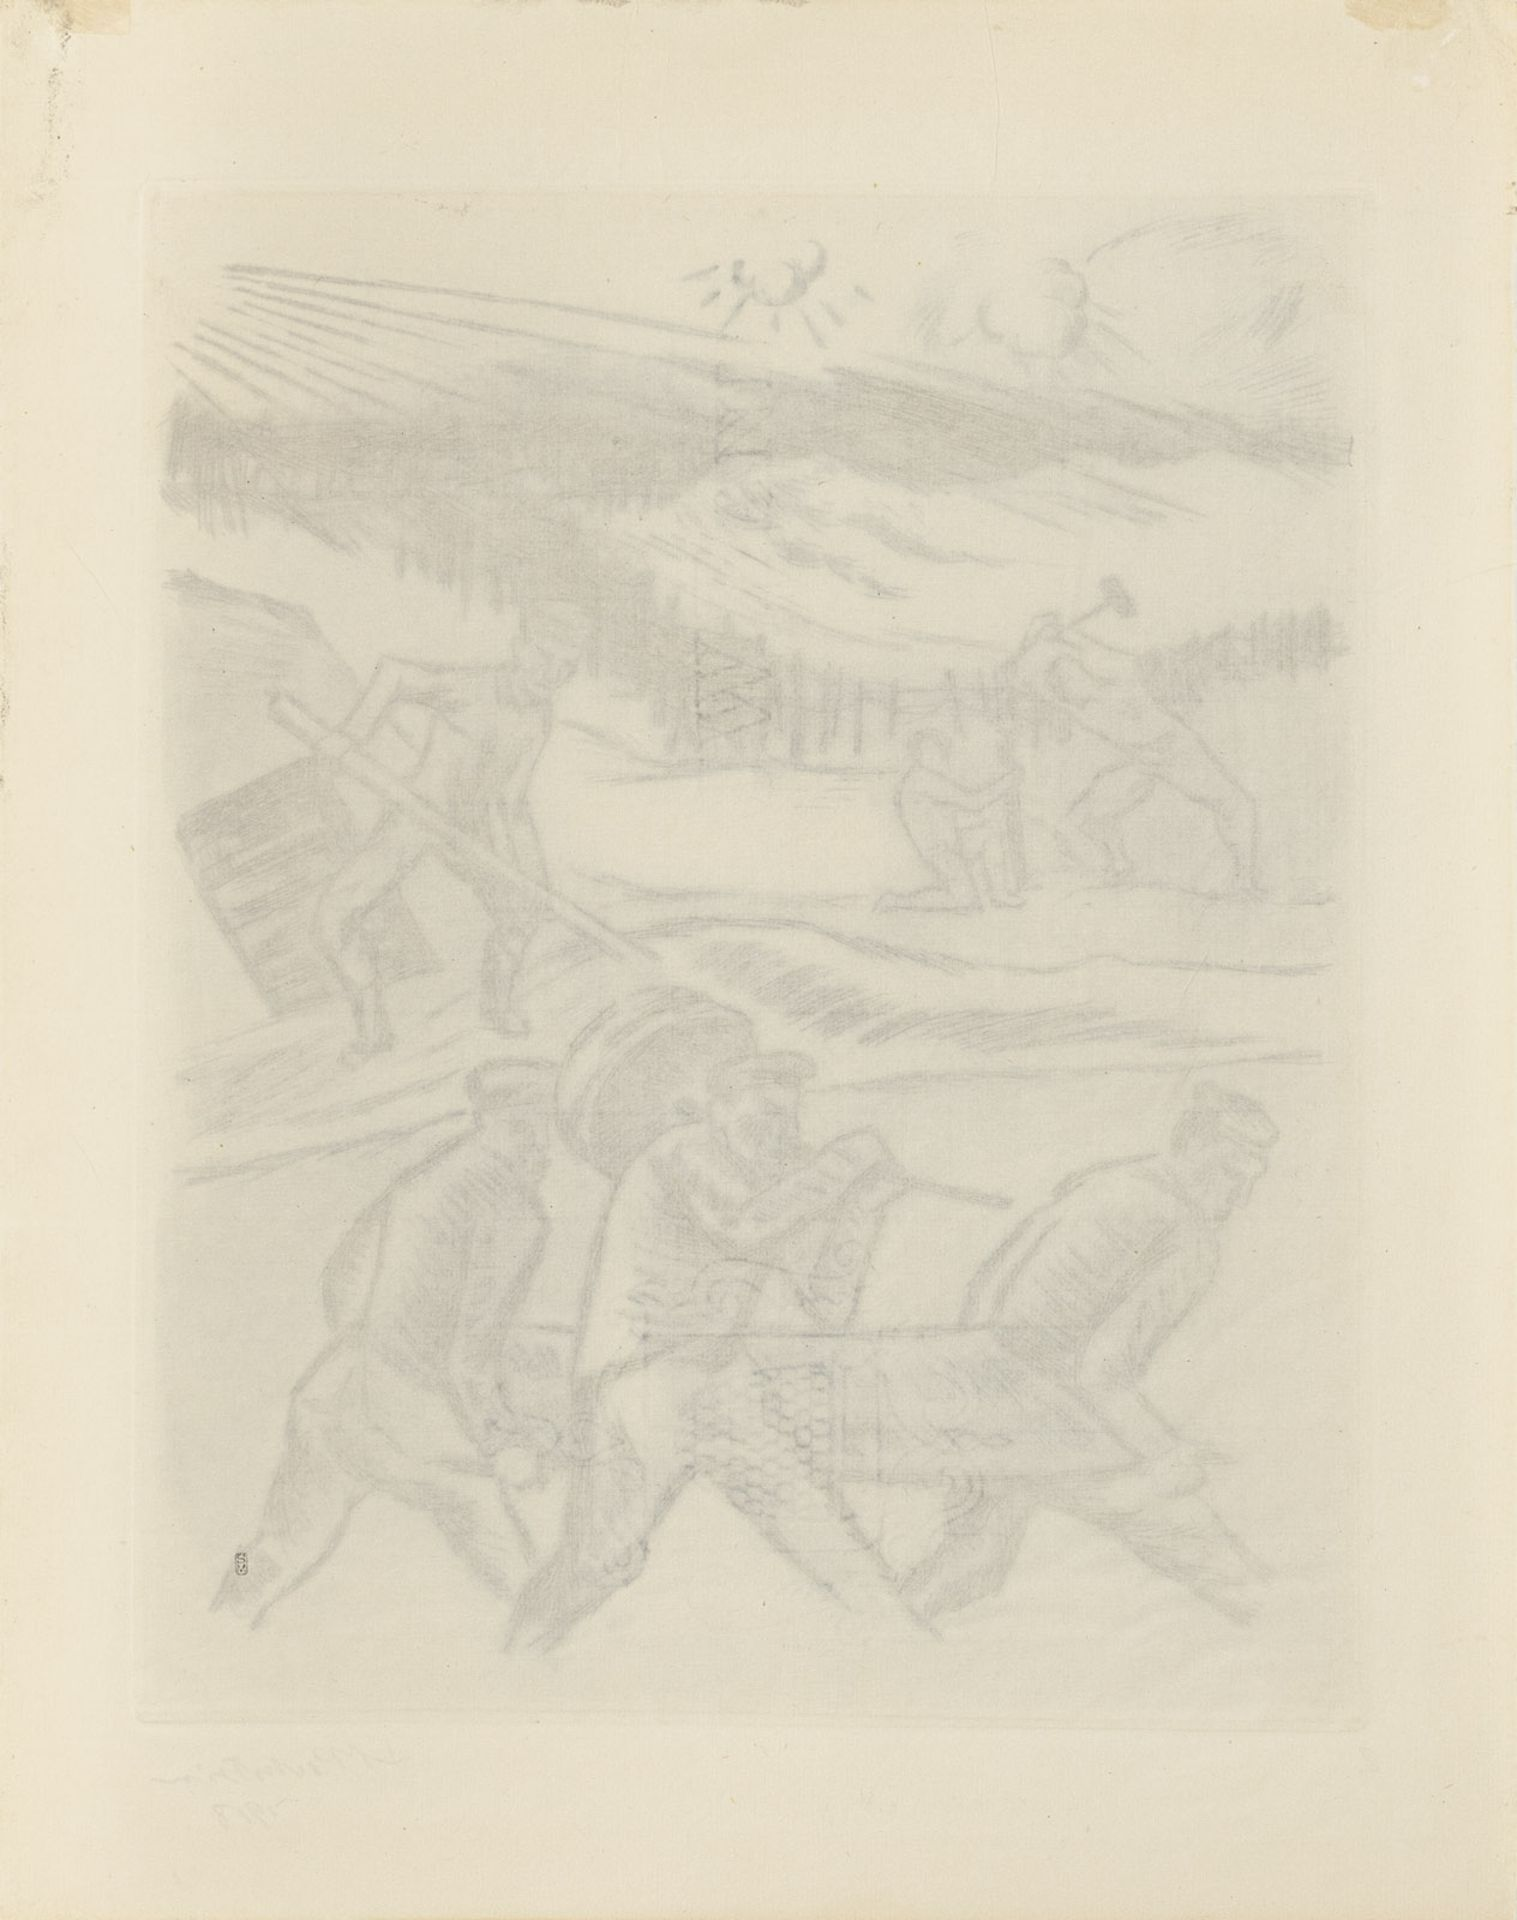 Pechstein, Max - Image 3 of 3